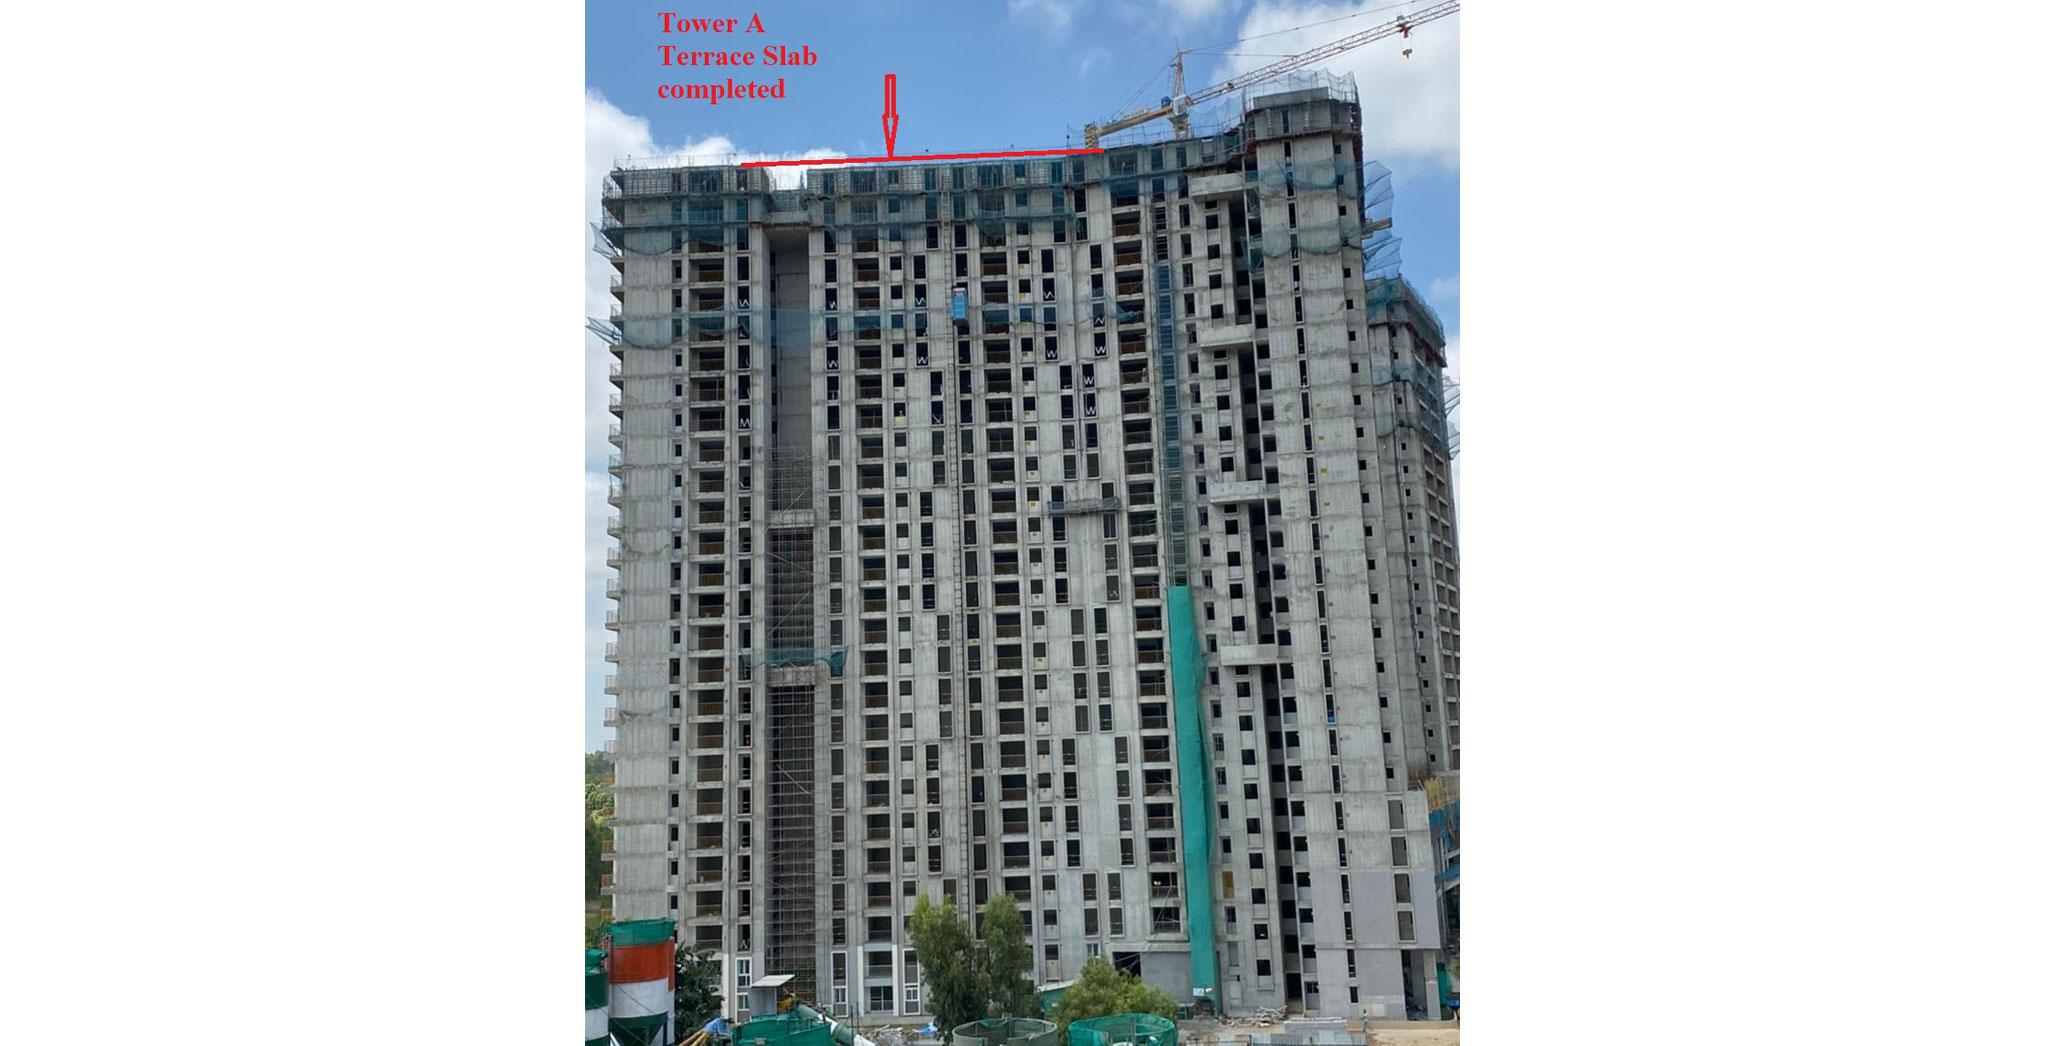 Aug 2021 - Brigade Cornerstone Utopia Serene Tower/Wing A: Casting of Terrace Floor Slab